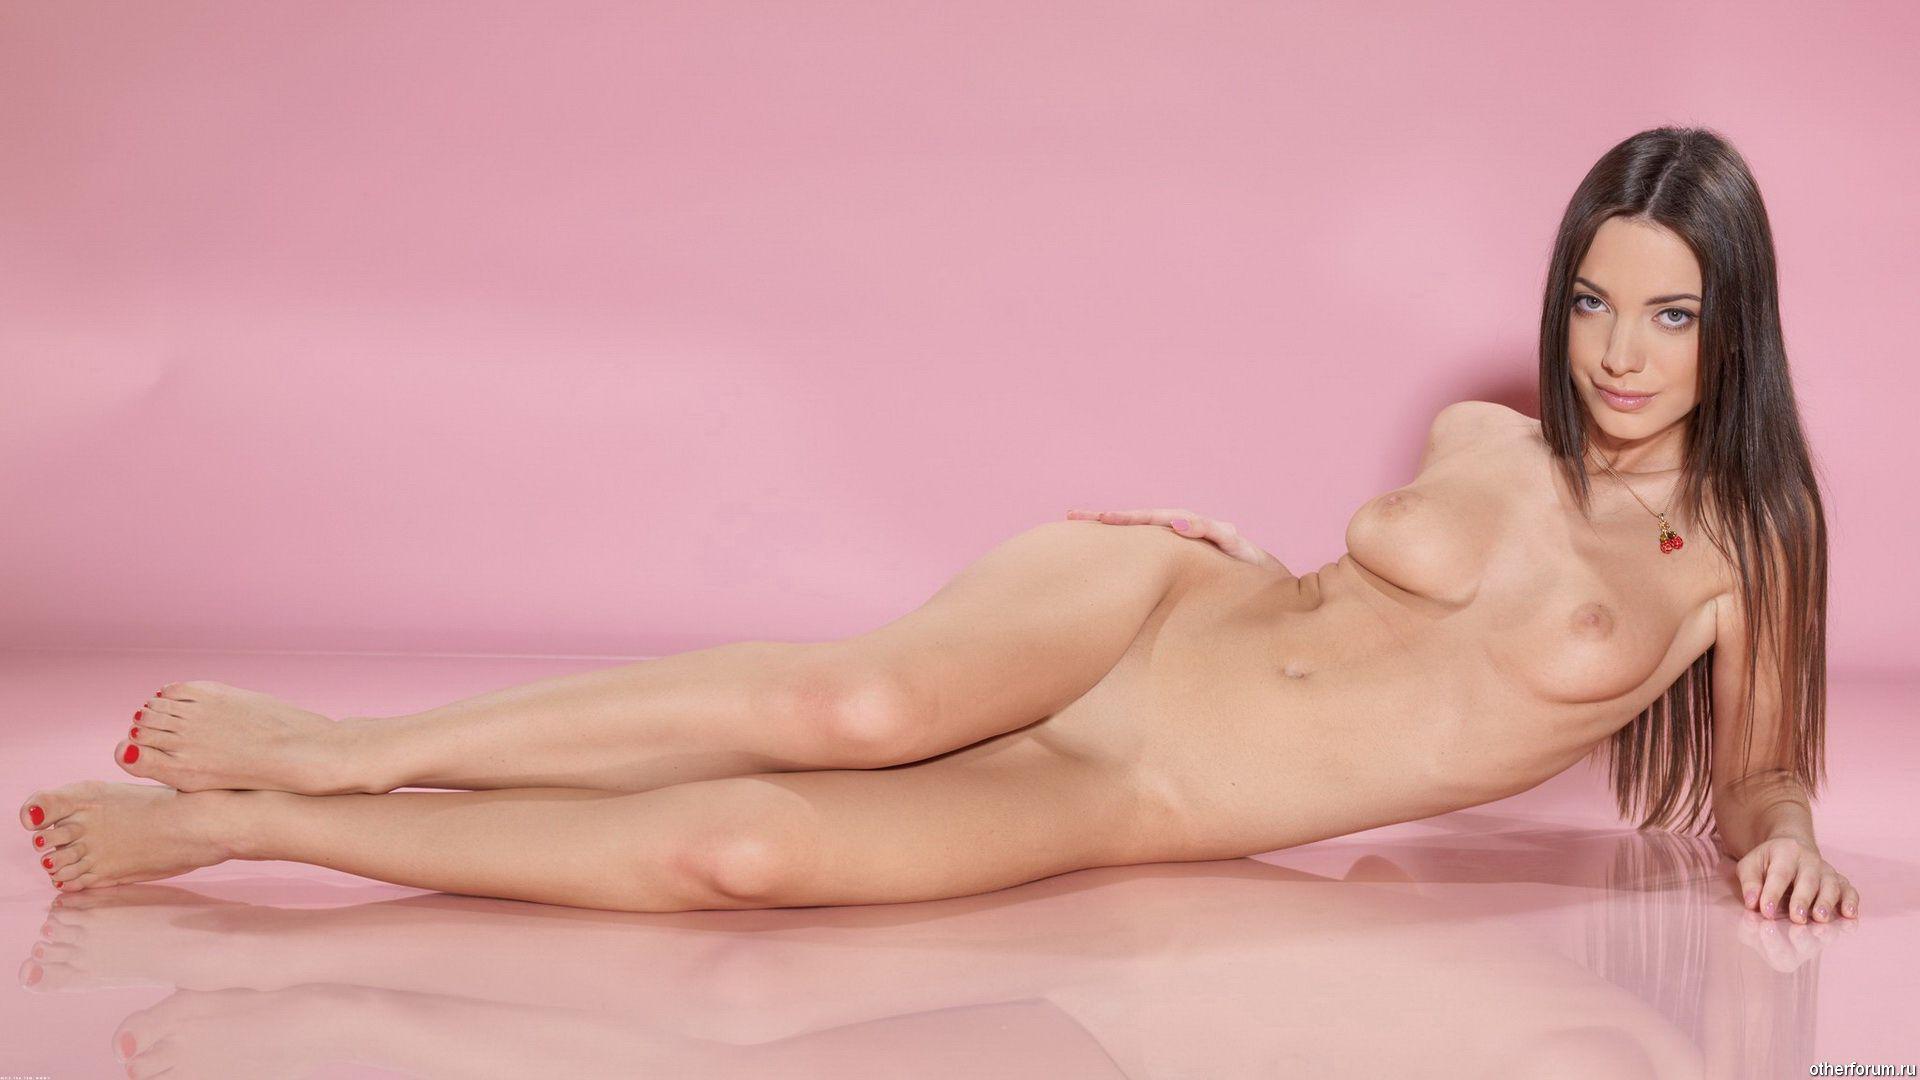 Секс еротика нозия, Секс нозия таджикистан артист (видео) 21 фотография